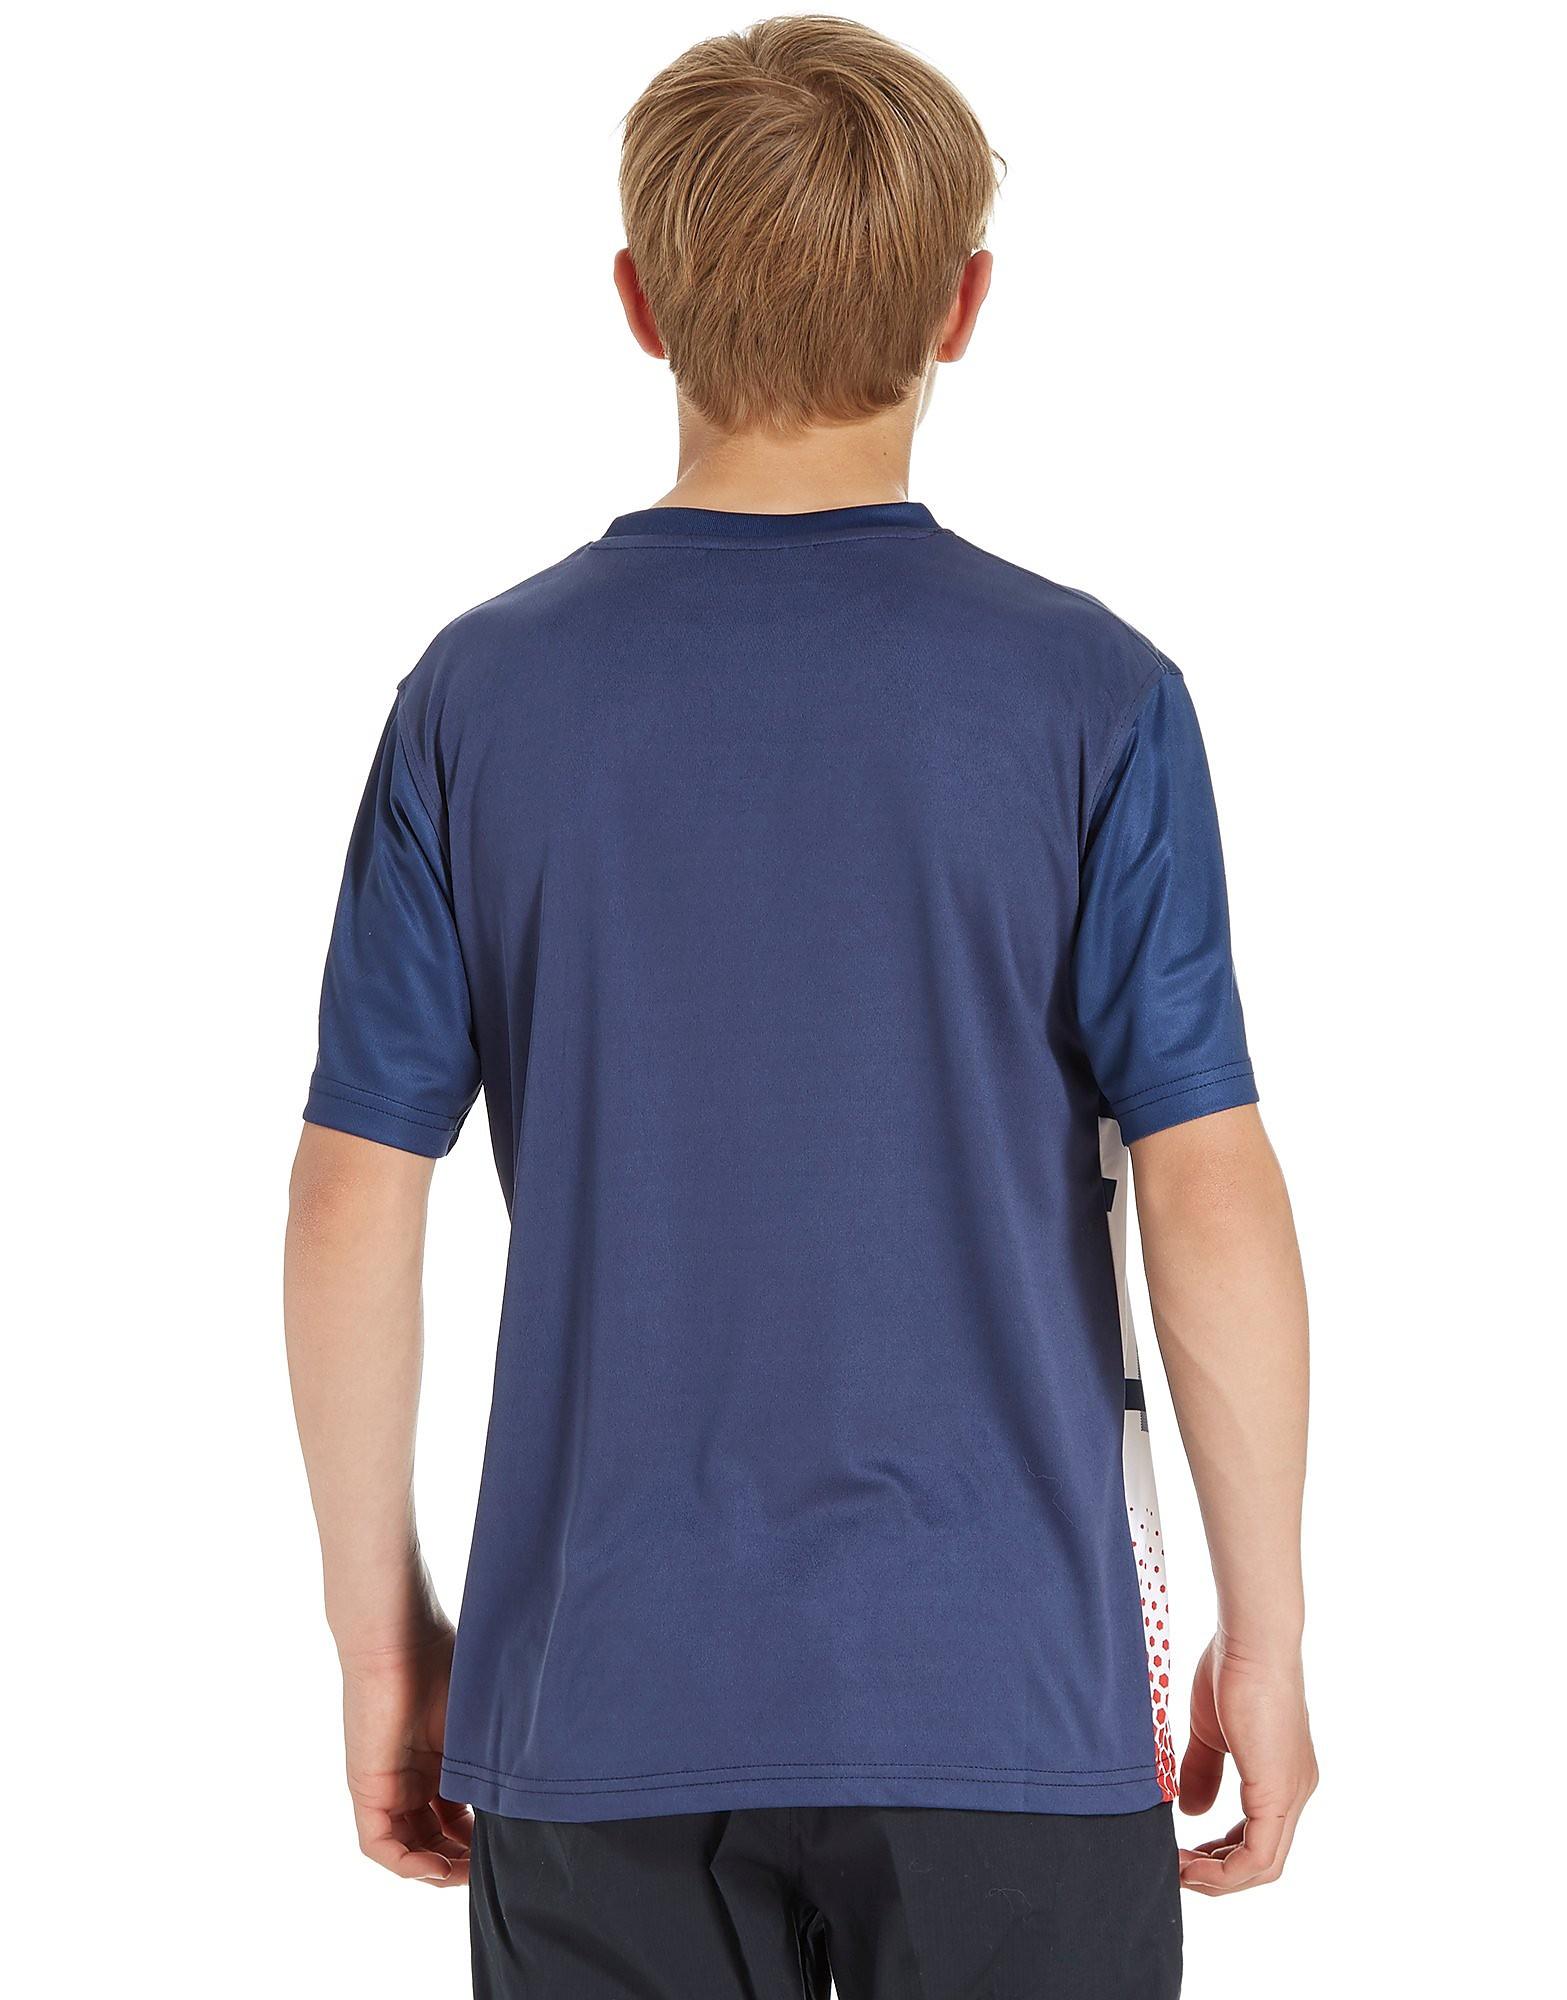 McKenzie Fisher Poly T-Shirt Junior